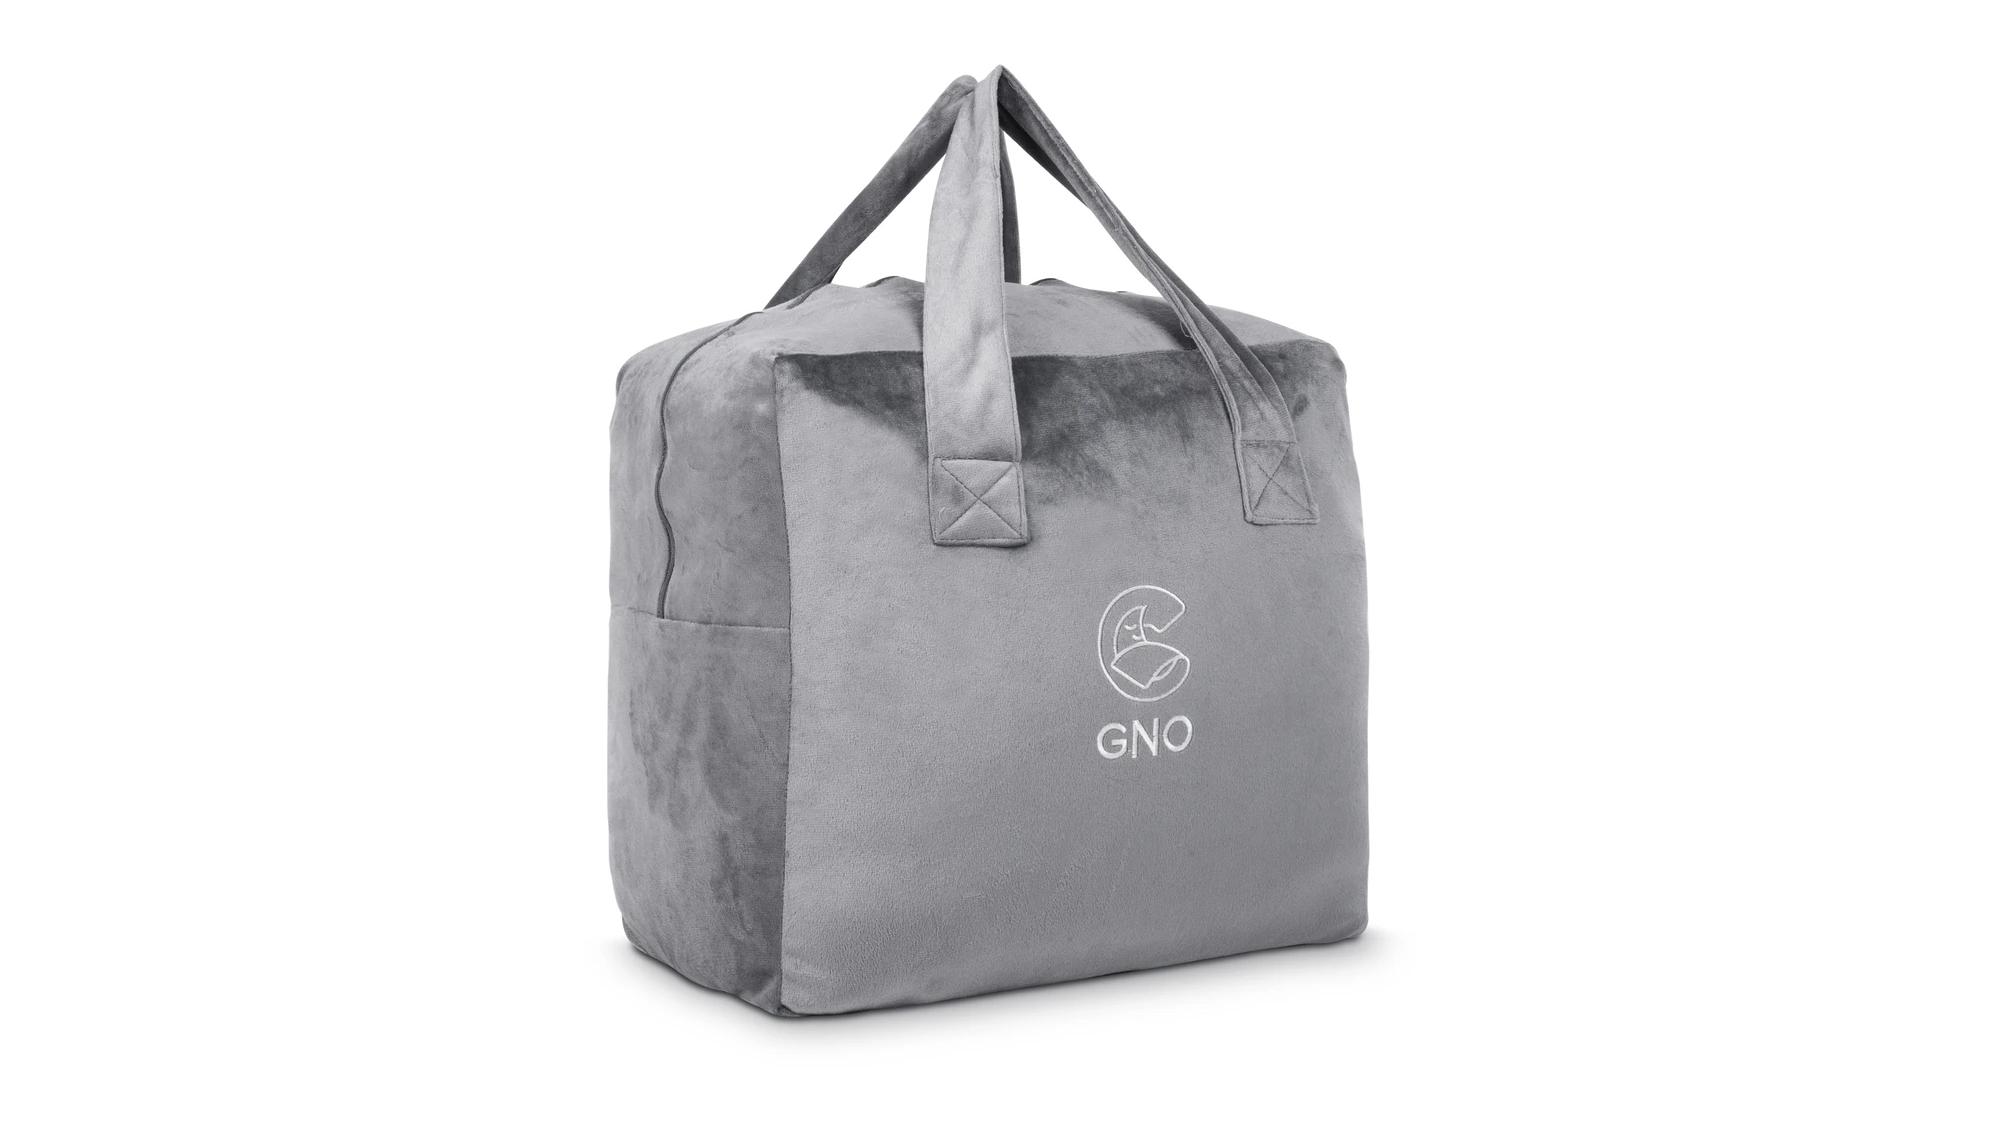 bag gno blankets branding case study tubik